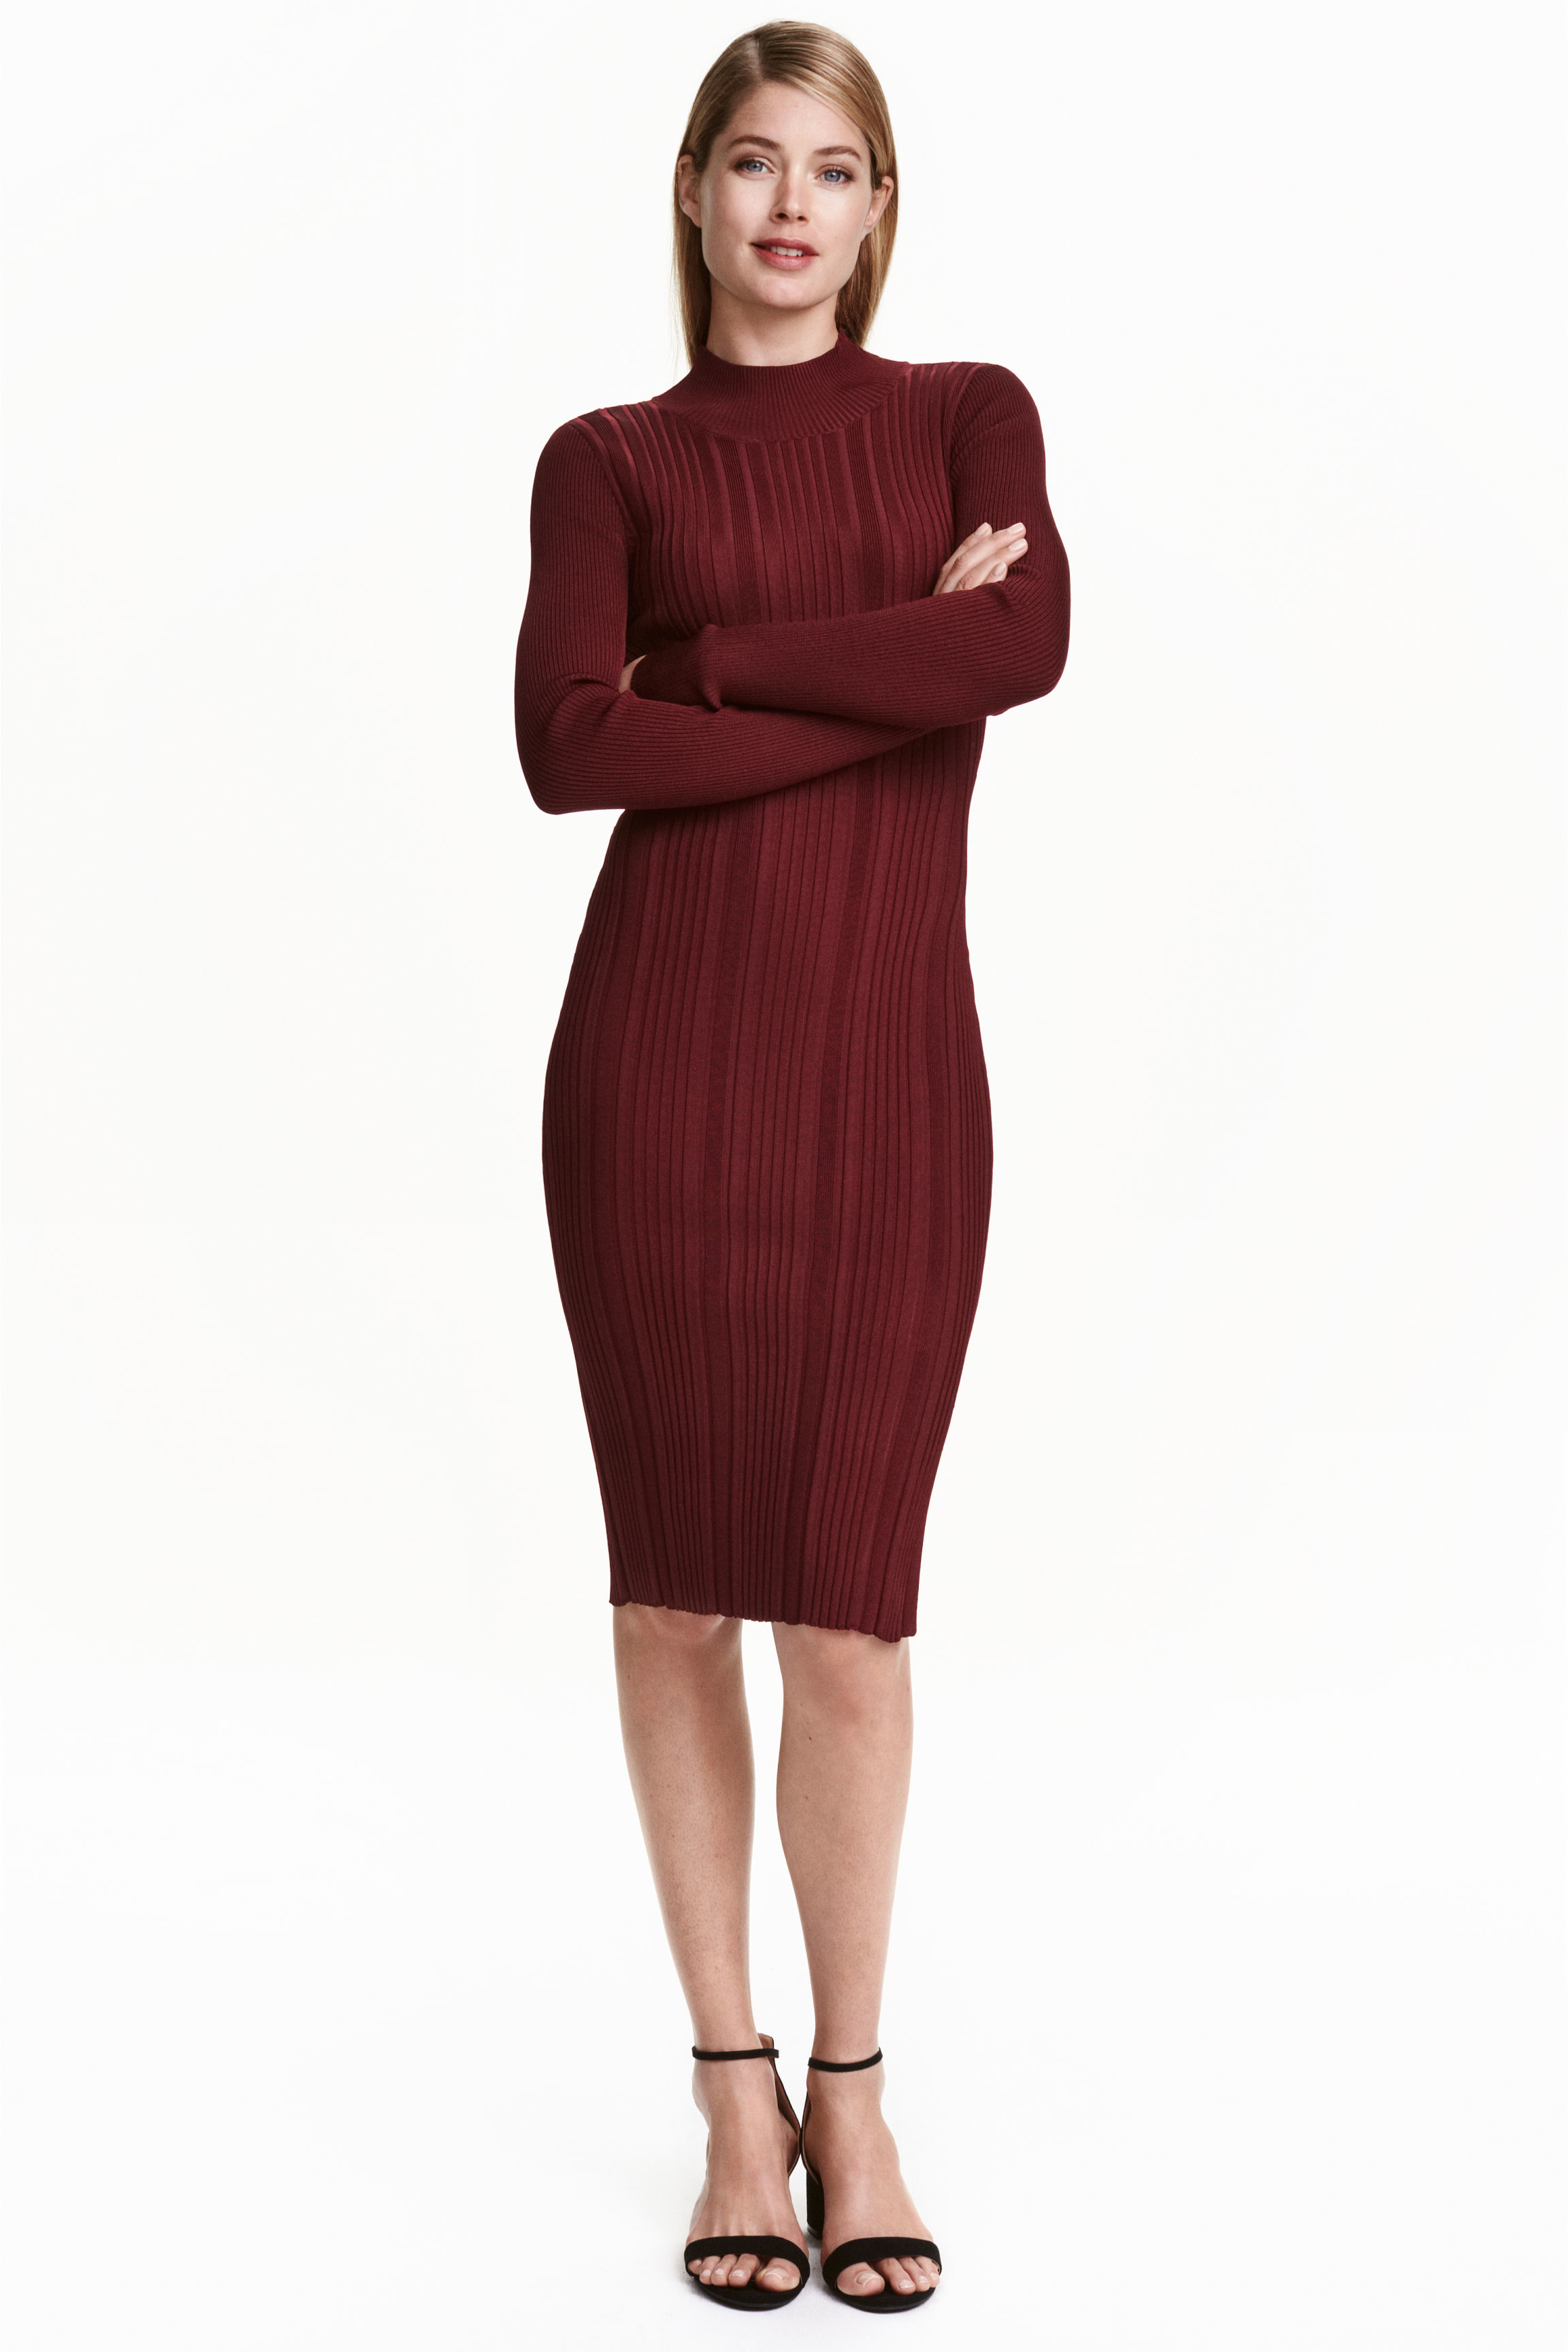 H&M Black X Lanvin Crossover Draped Puff Sleeve Lbd Cocktail Dress $ $ US 4 (S).